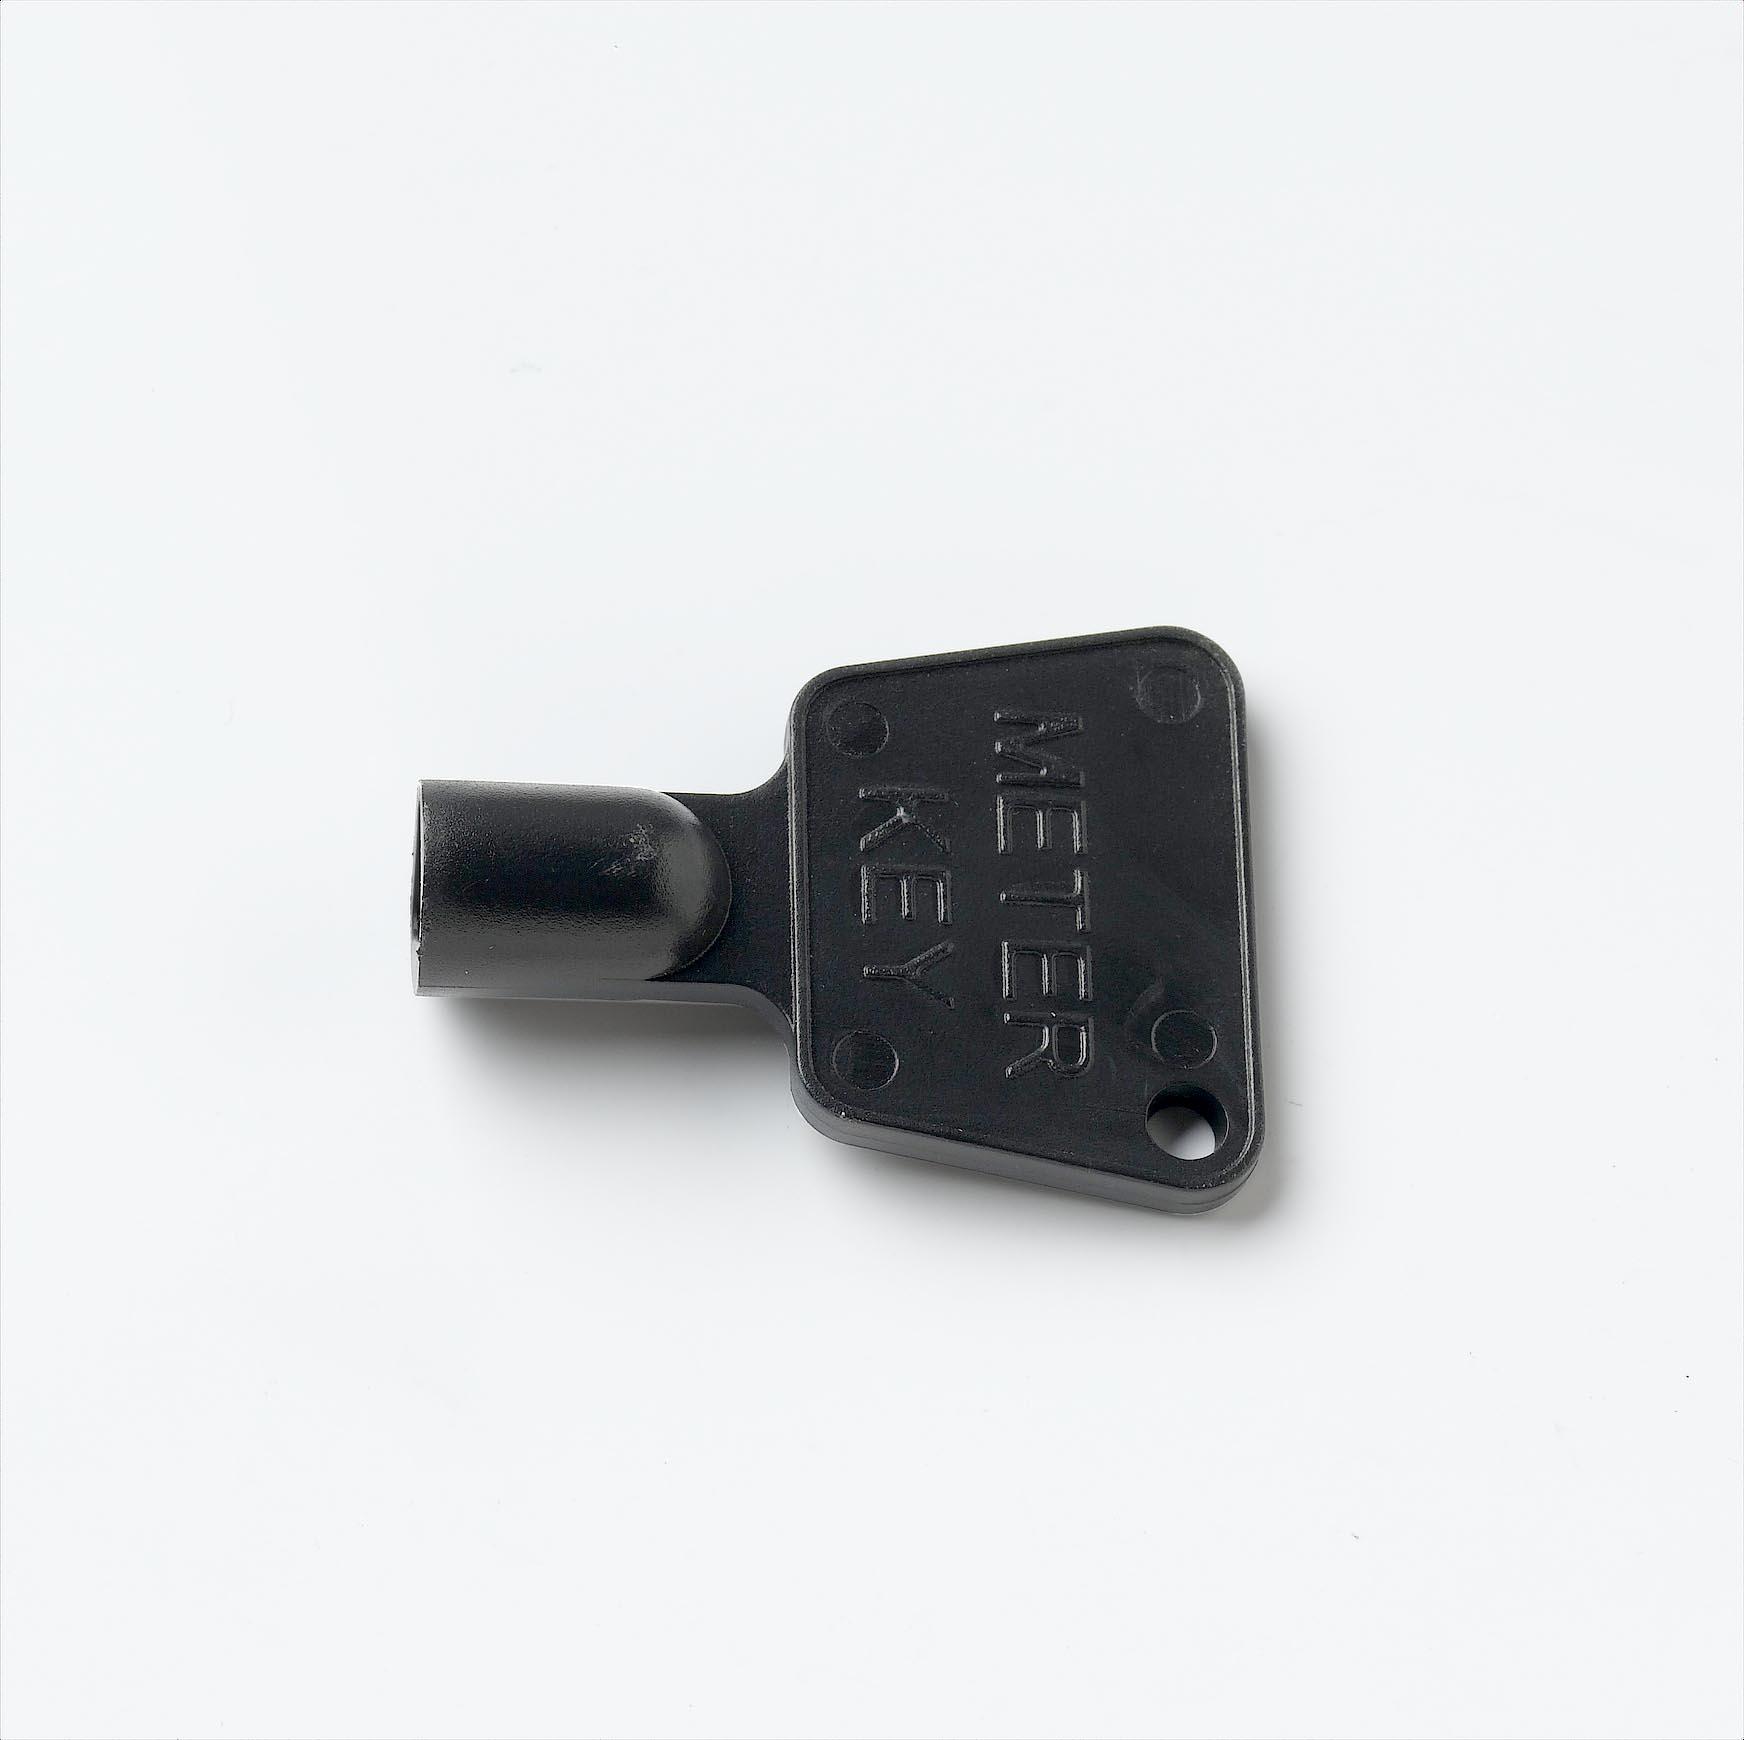 STARPACK METER BOX KEY BLACK PLASTIC QTY:2